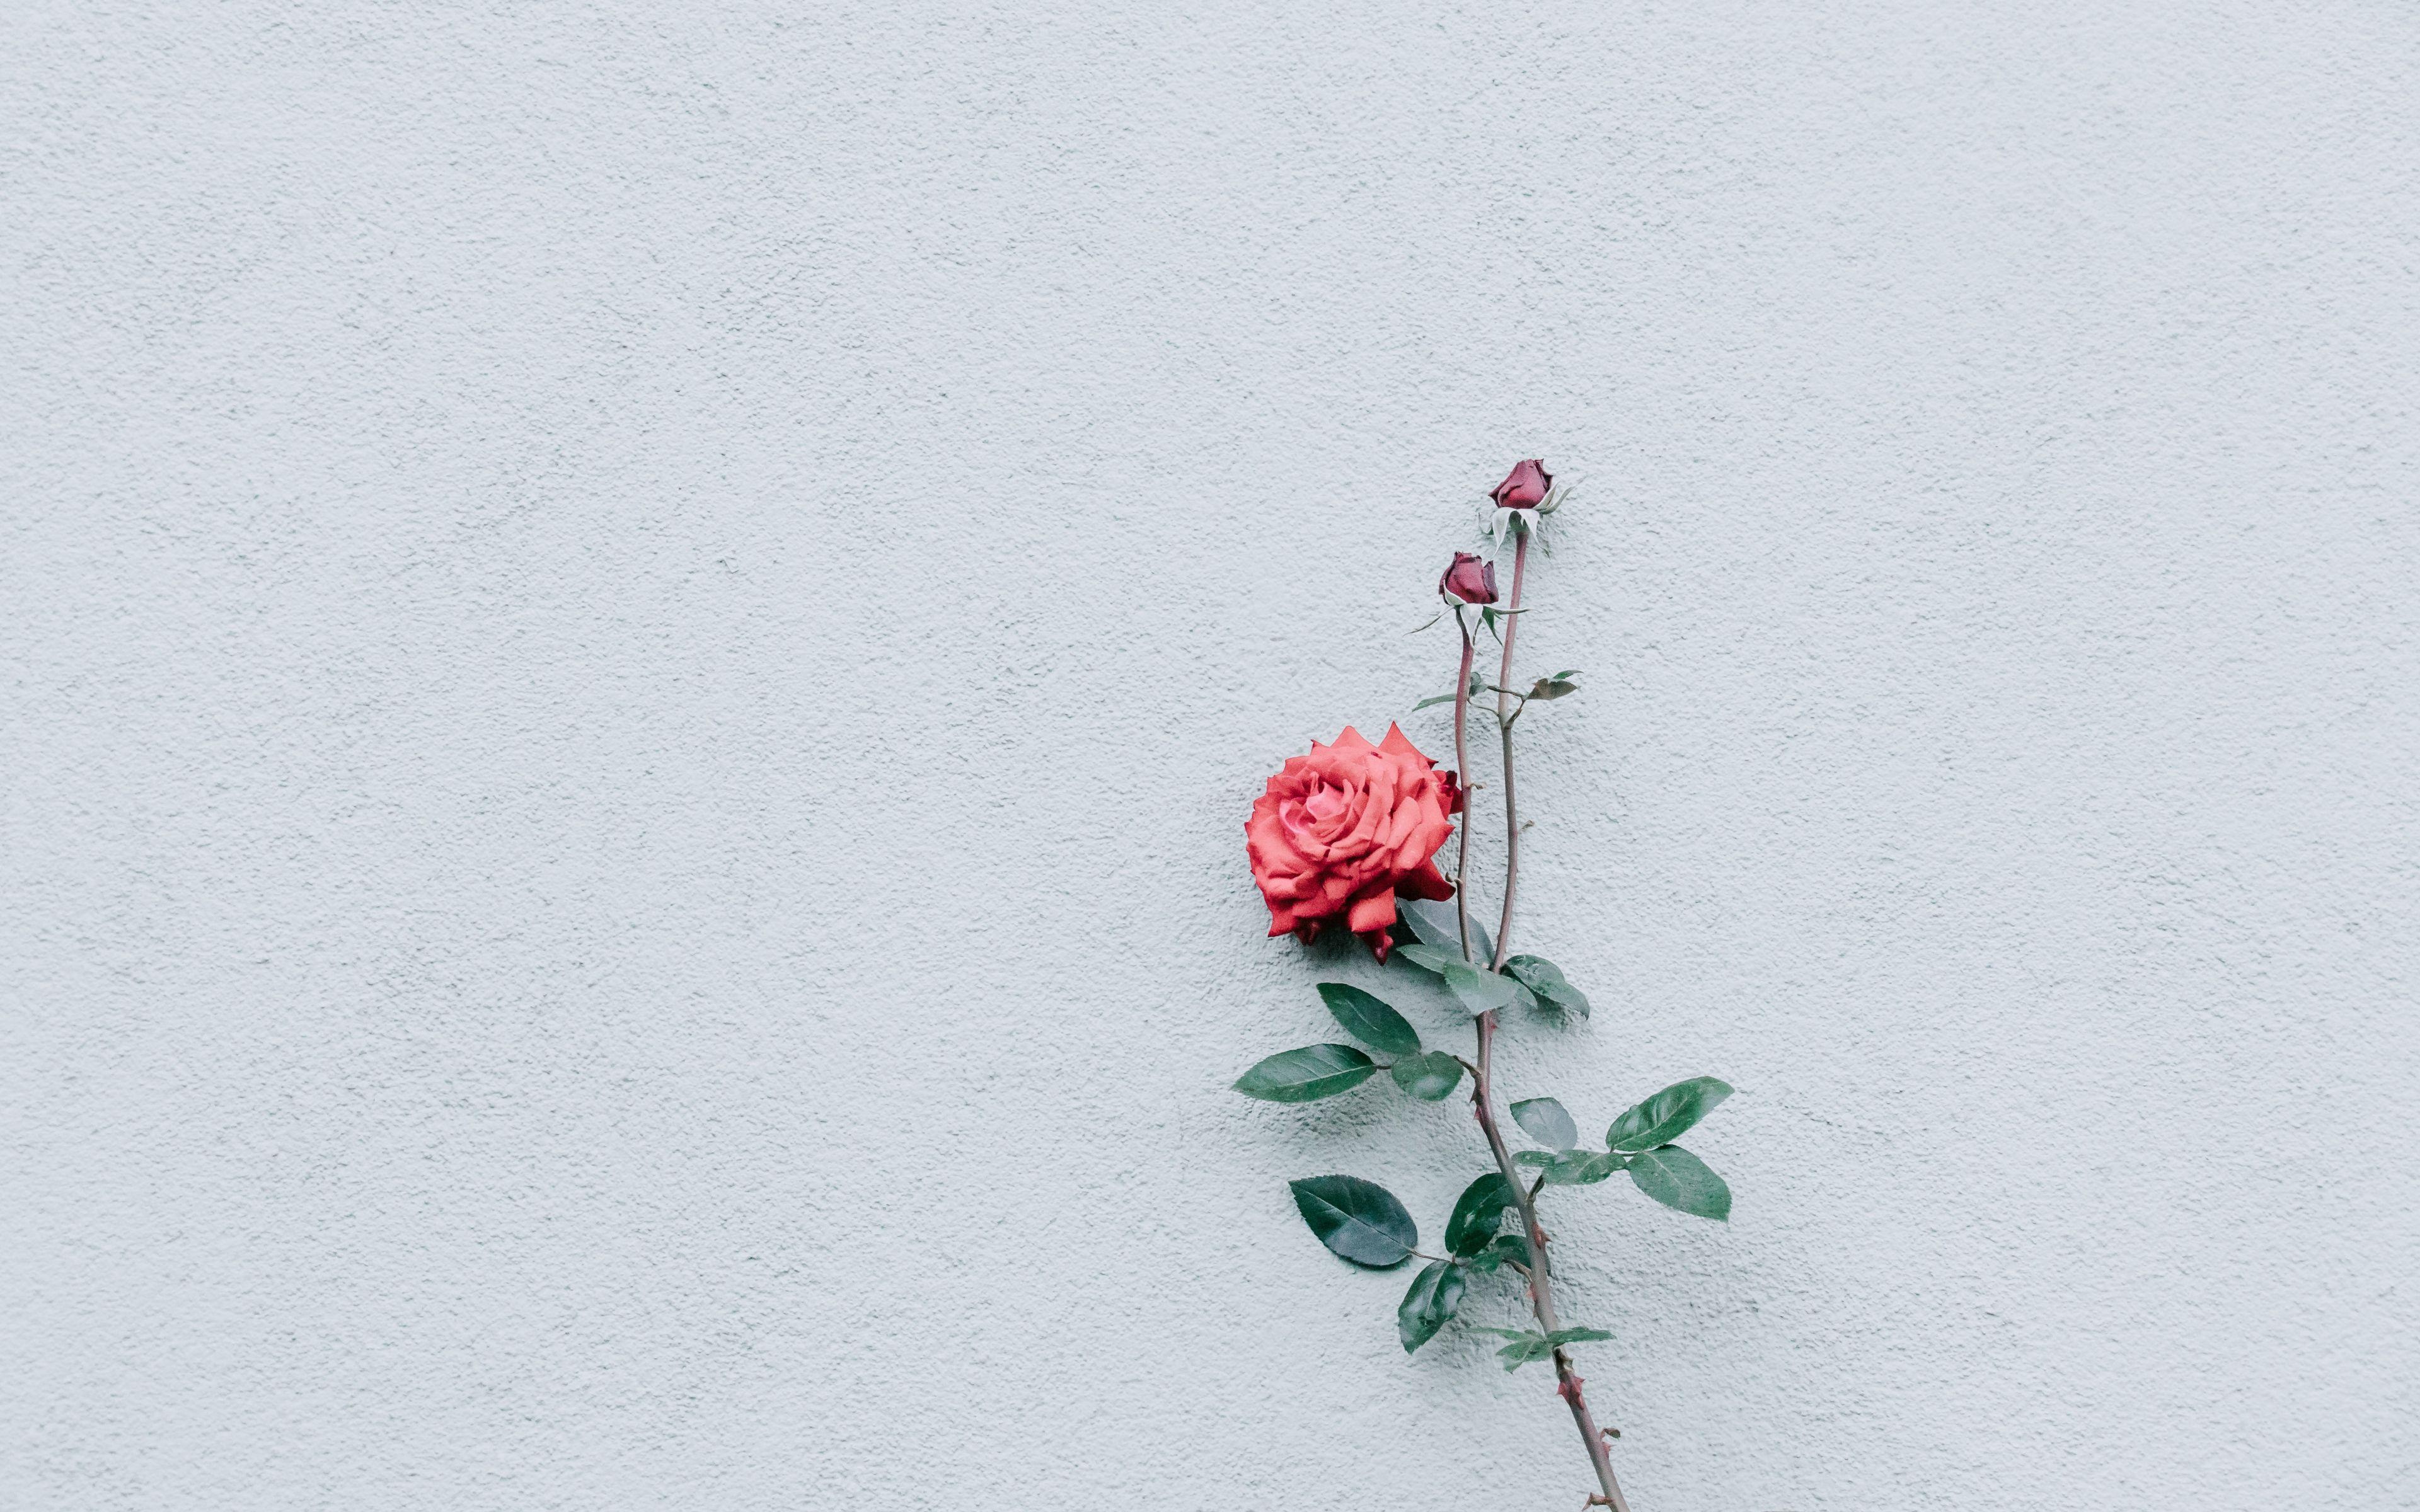 Minimal Flower Wallpapers - Wallpaper Cave